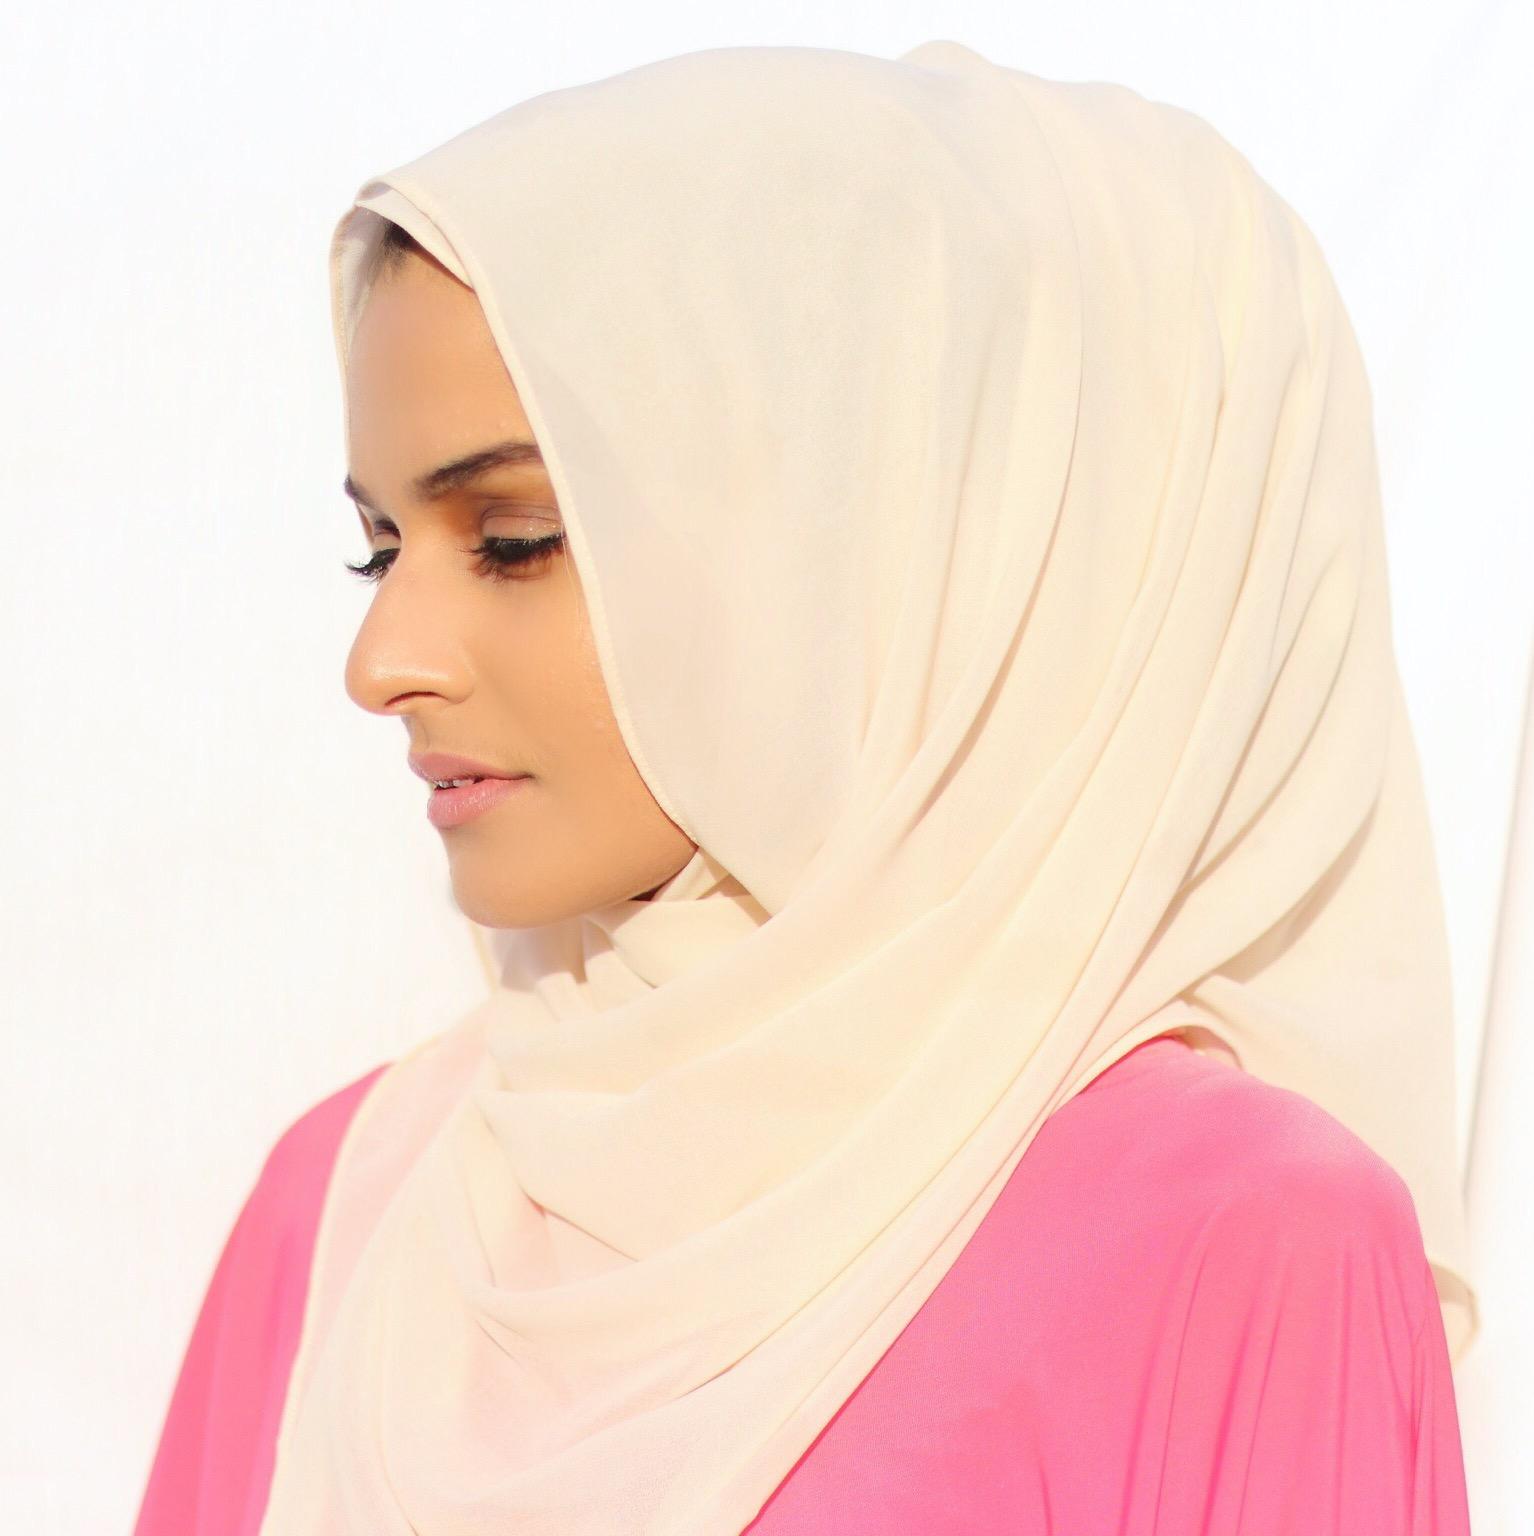 dress - How to infinity wear scarf hijab video